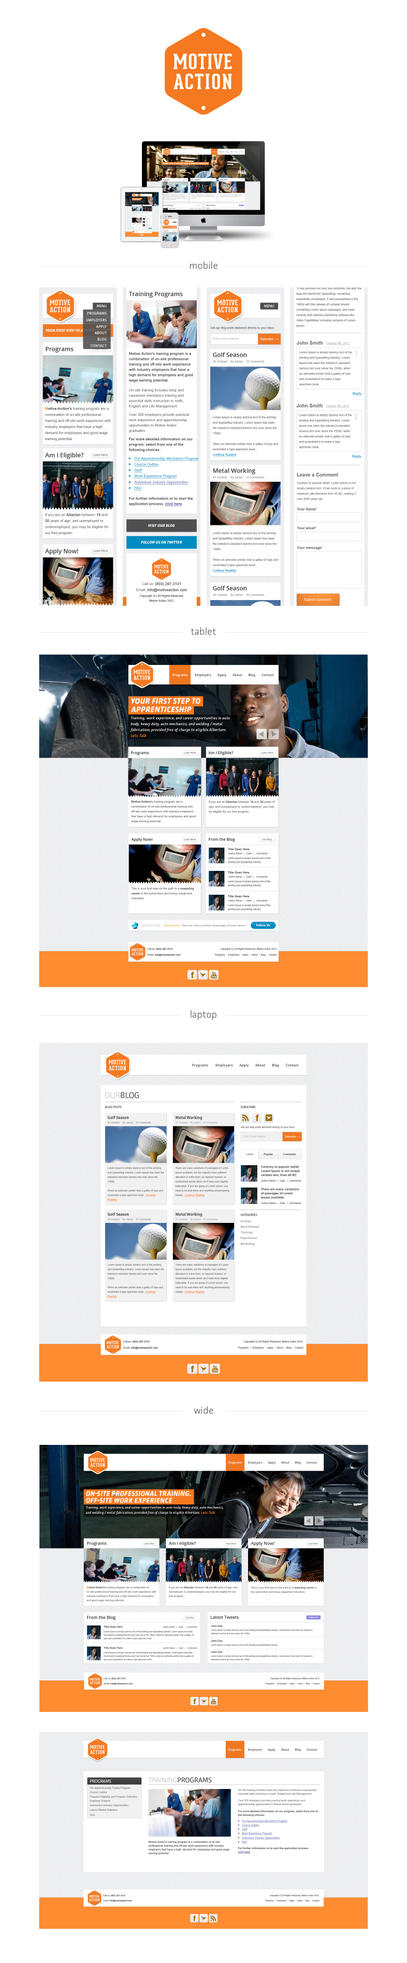 MA Responsive Design by manujg